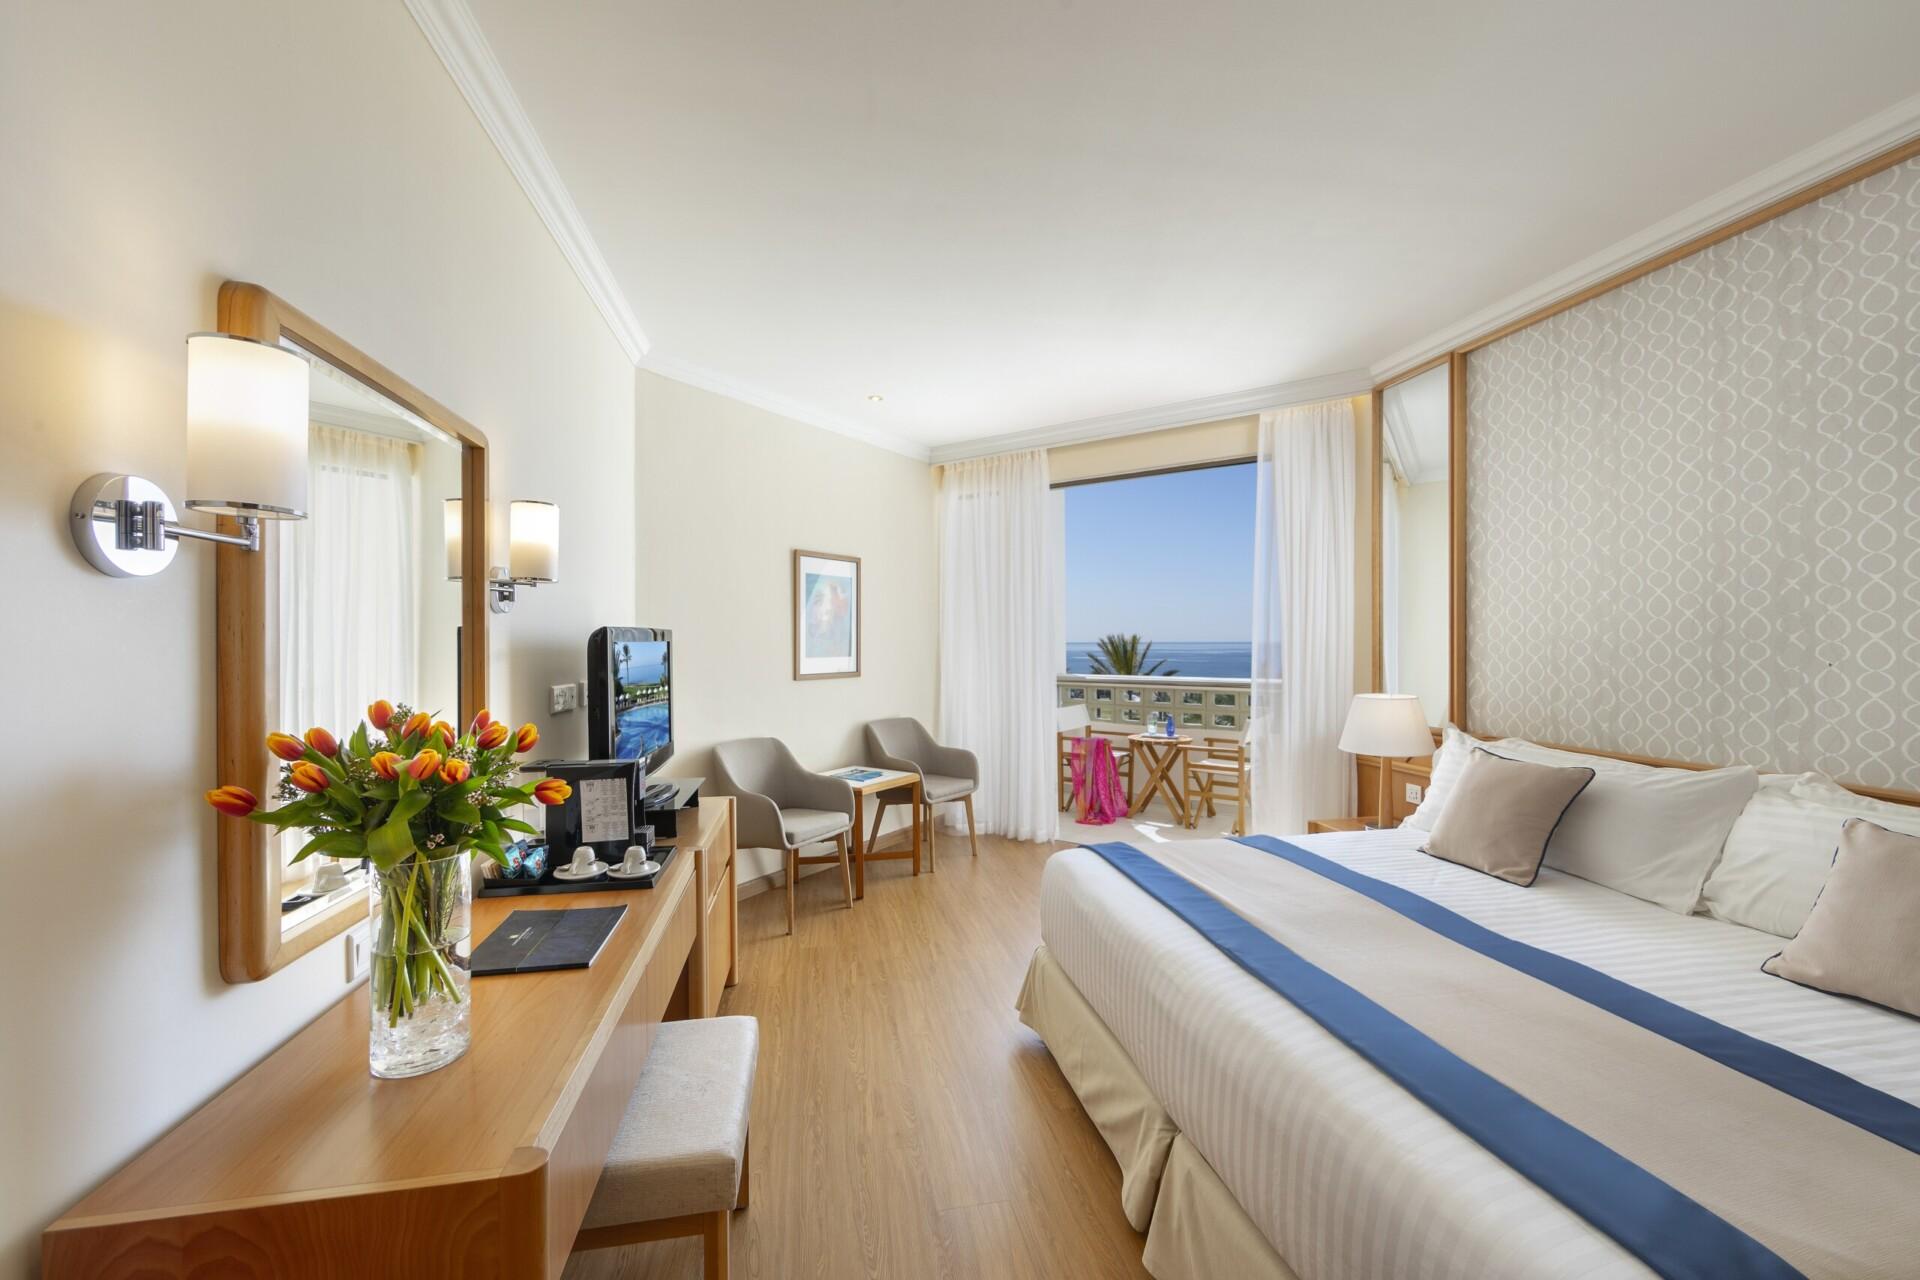 24 ATHENA BEACH HOTEL CLASSIC ROOM SV